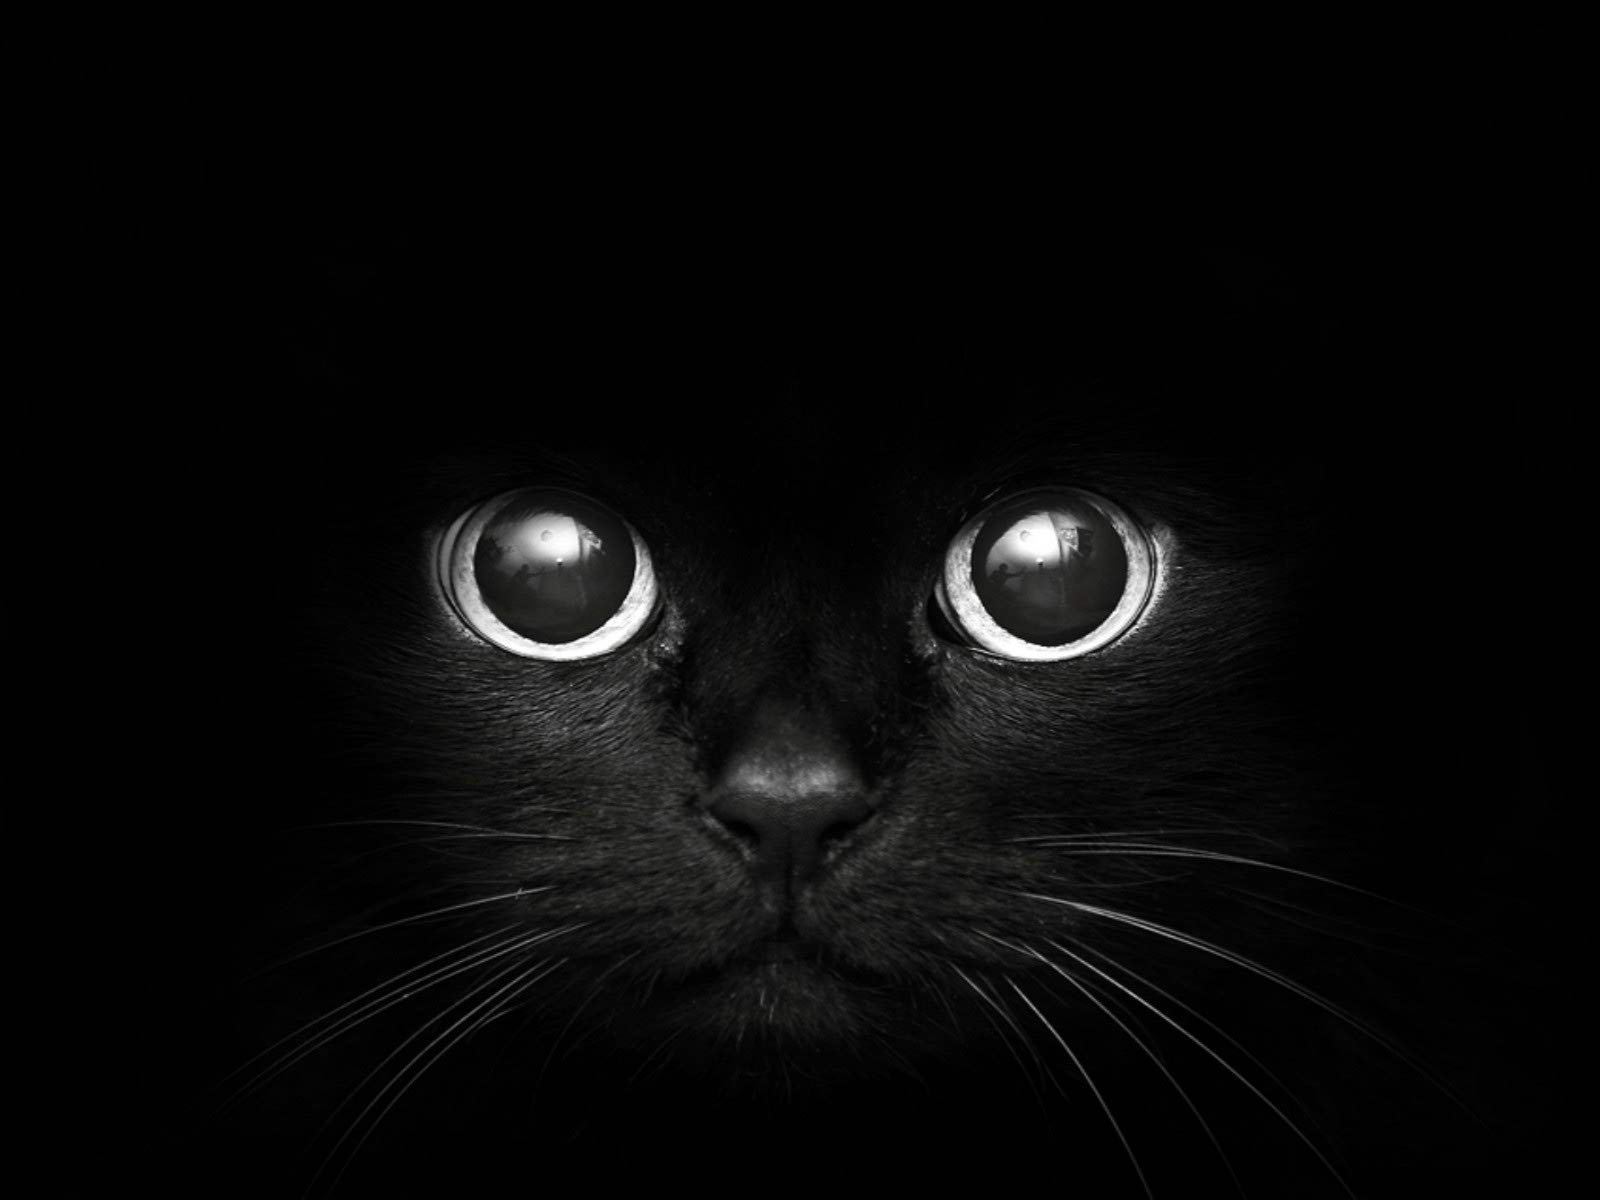 Black Cat Background, Blue Eyes Black Cat Background, #21836